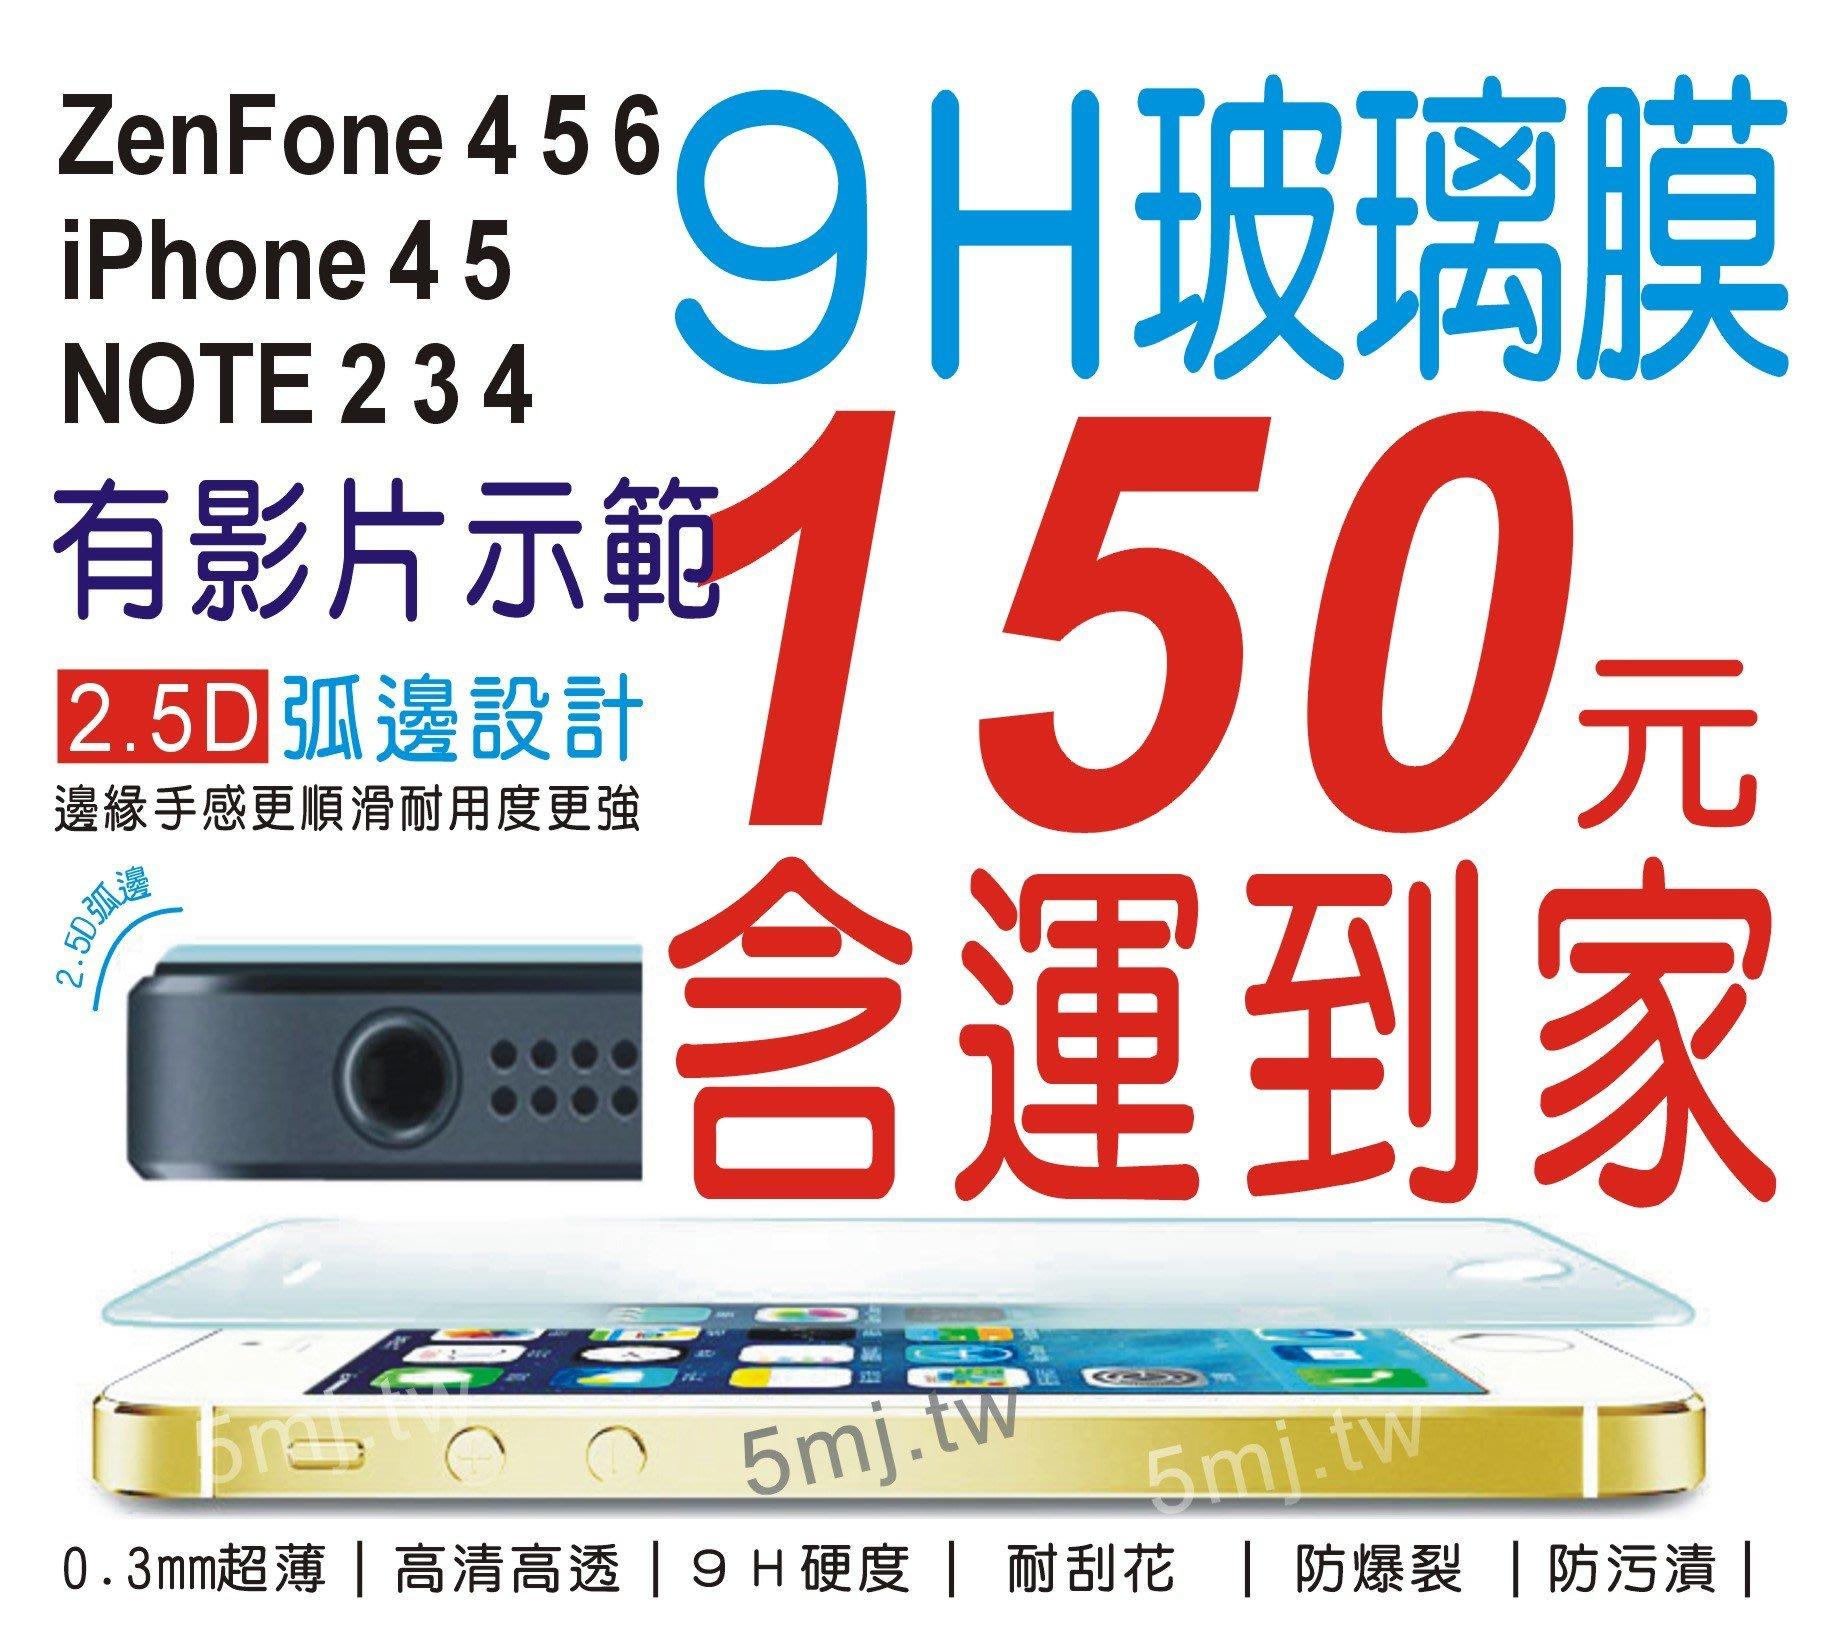 5mj.tw 9H鋼化玻璃保護貼NOTE2 HTC816 ZenFone 5 6 9h孤邊sony z3 z1 小米紅米